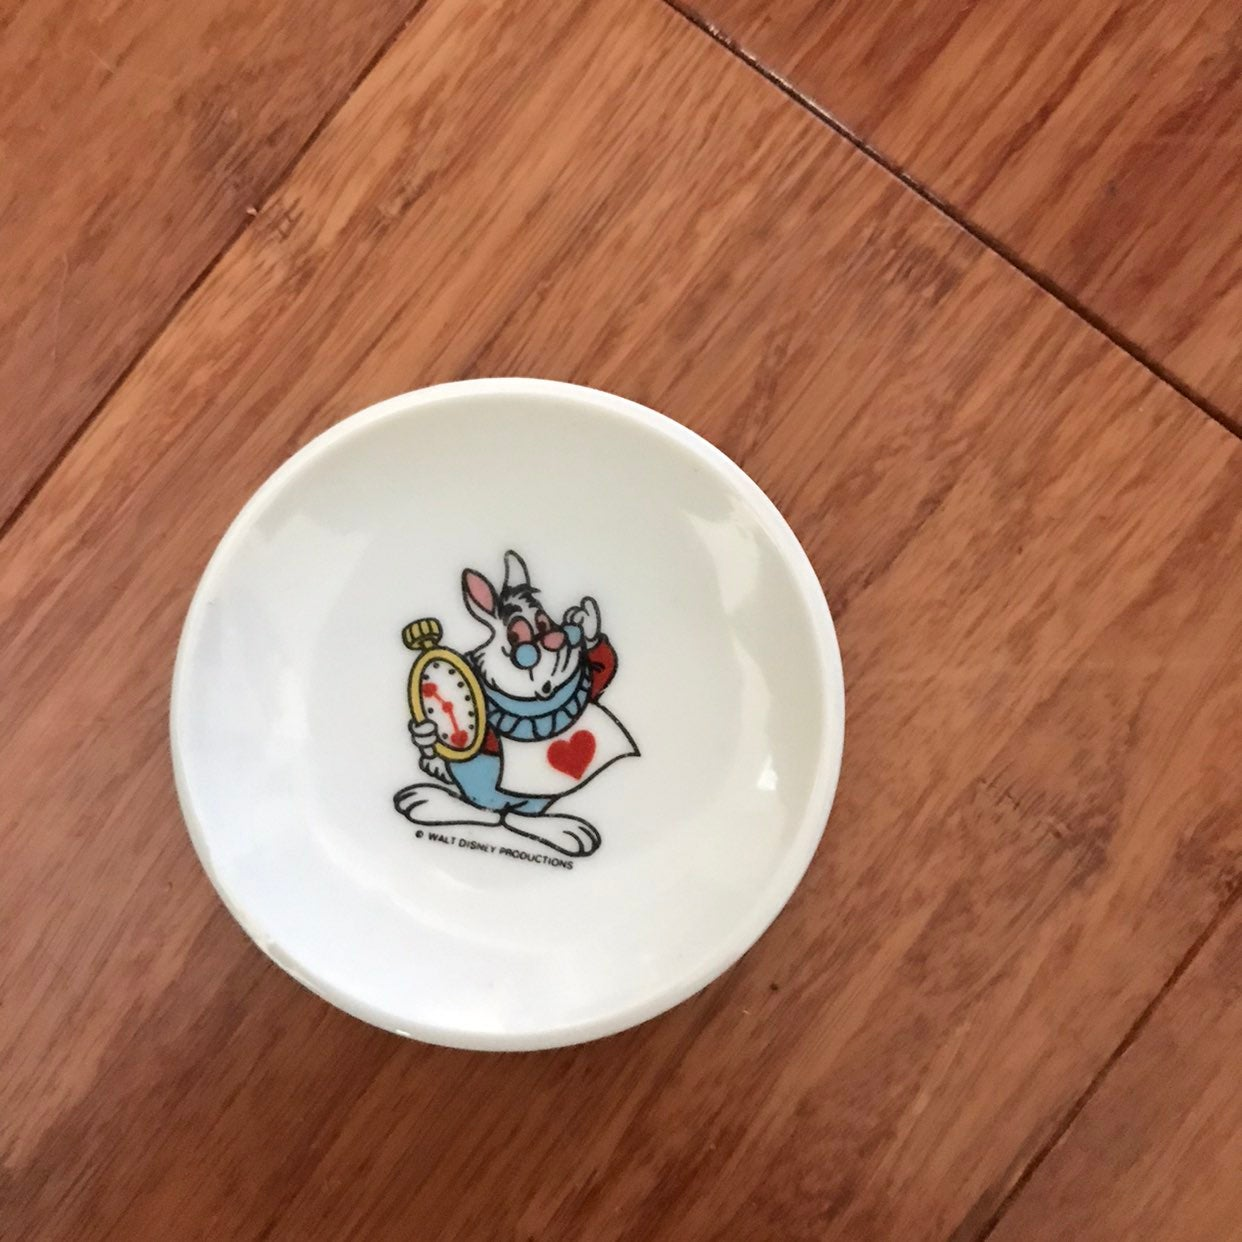 Vintage White Rabbit plate